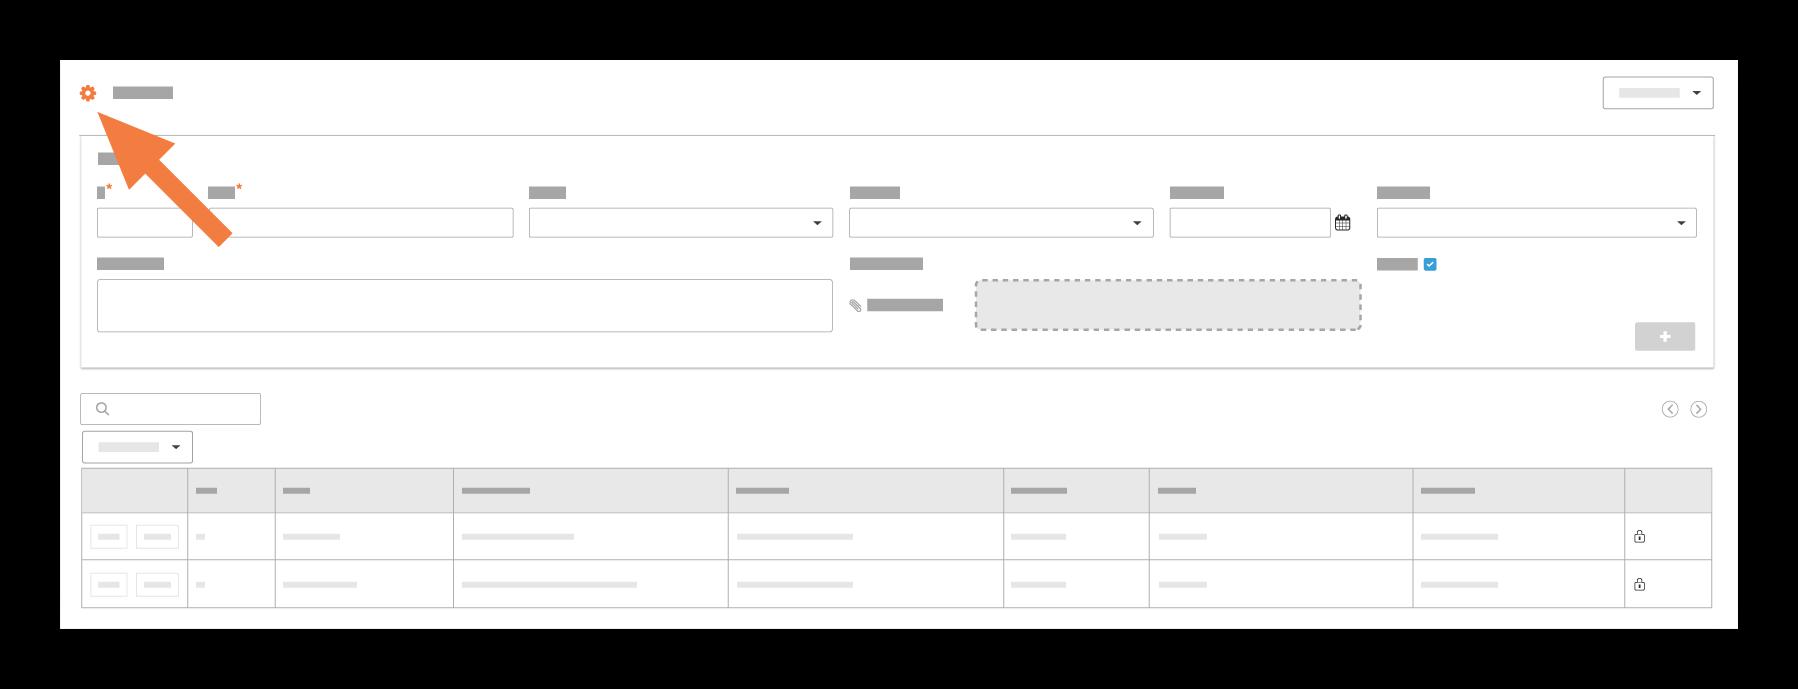 configure-tasks.png